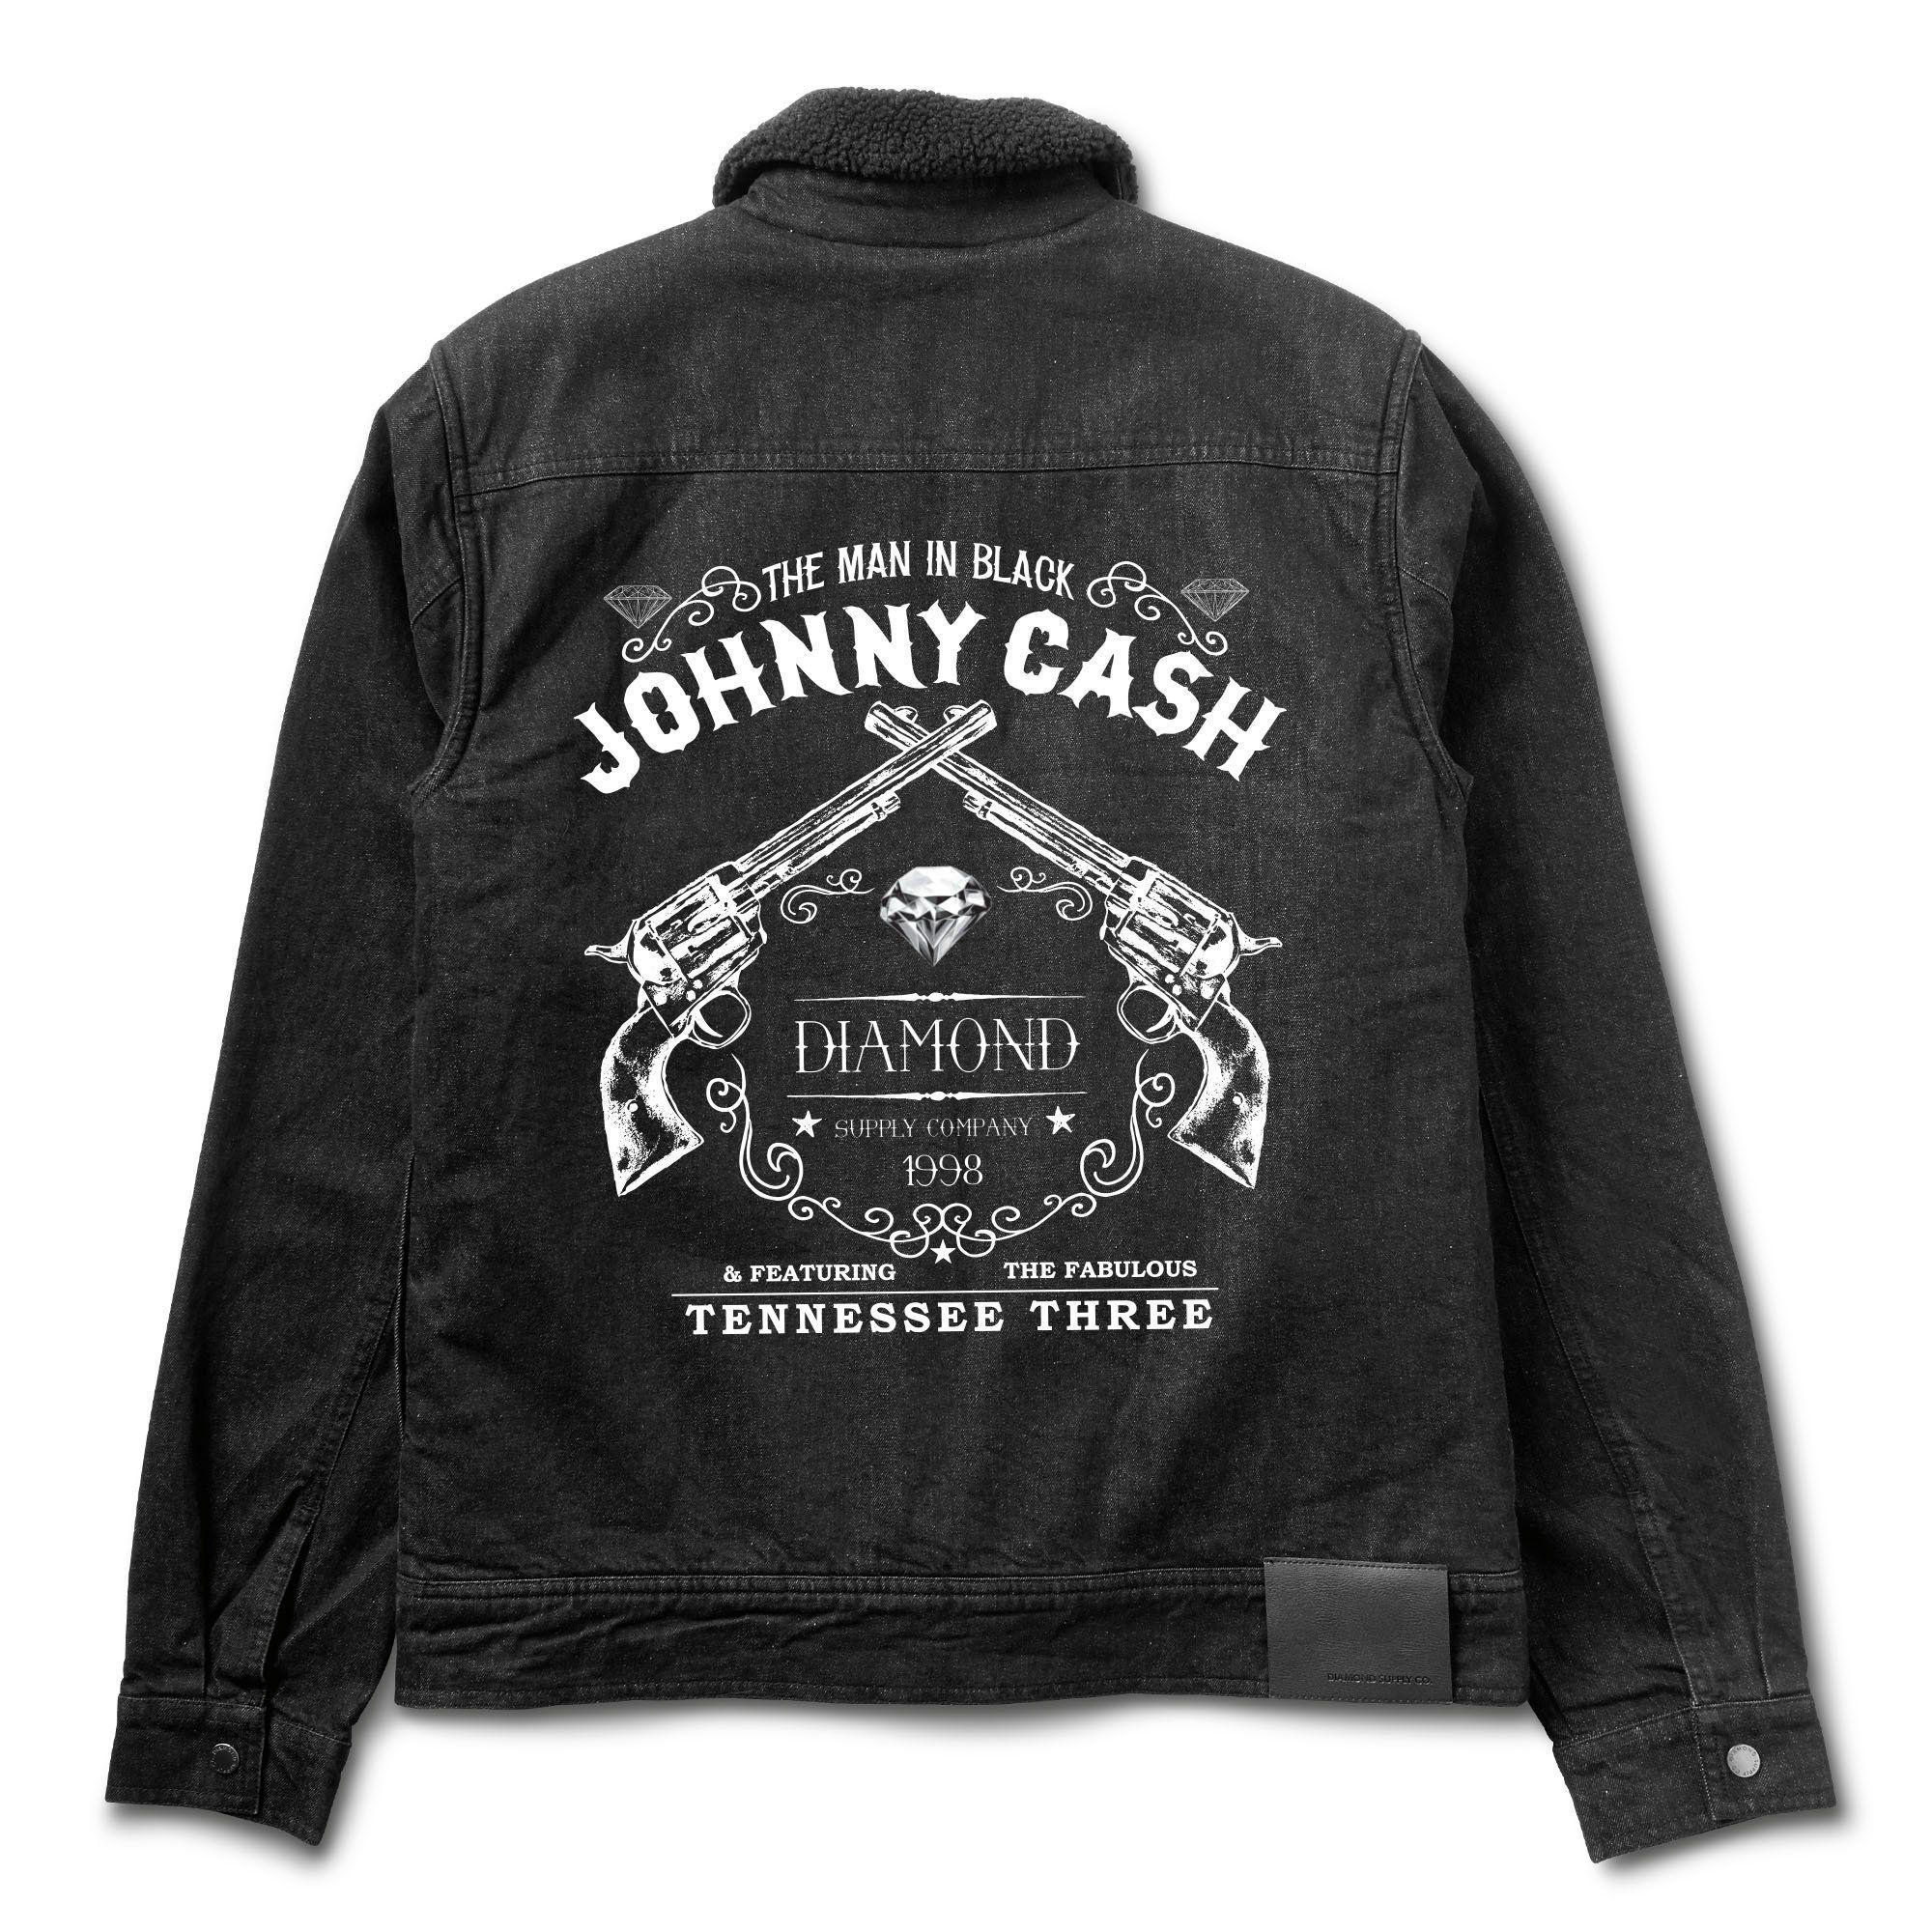 ffdeb83be84 Diamond x Johnny Cash Denim Jacket w  Pin Pack - Diamond Supply Co ...